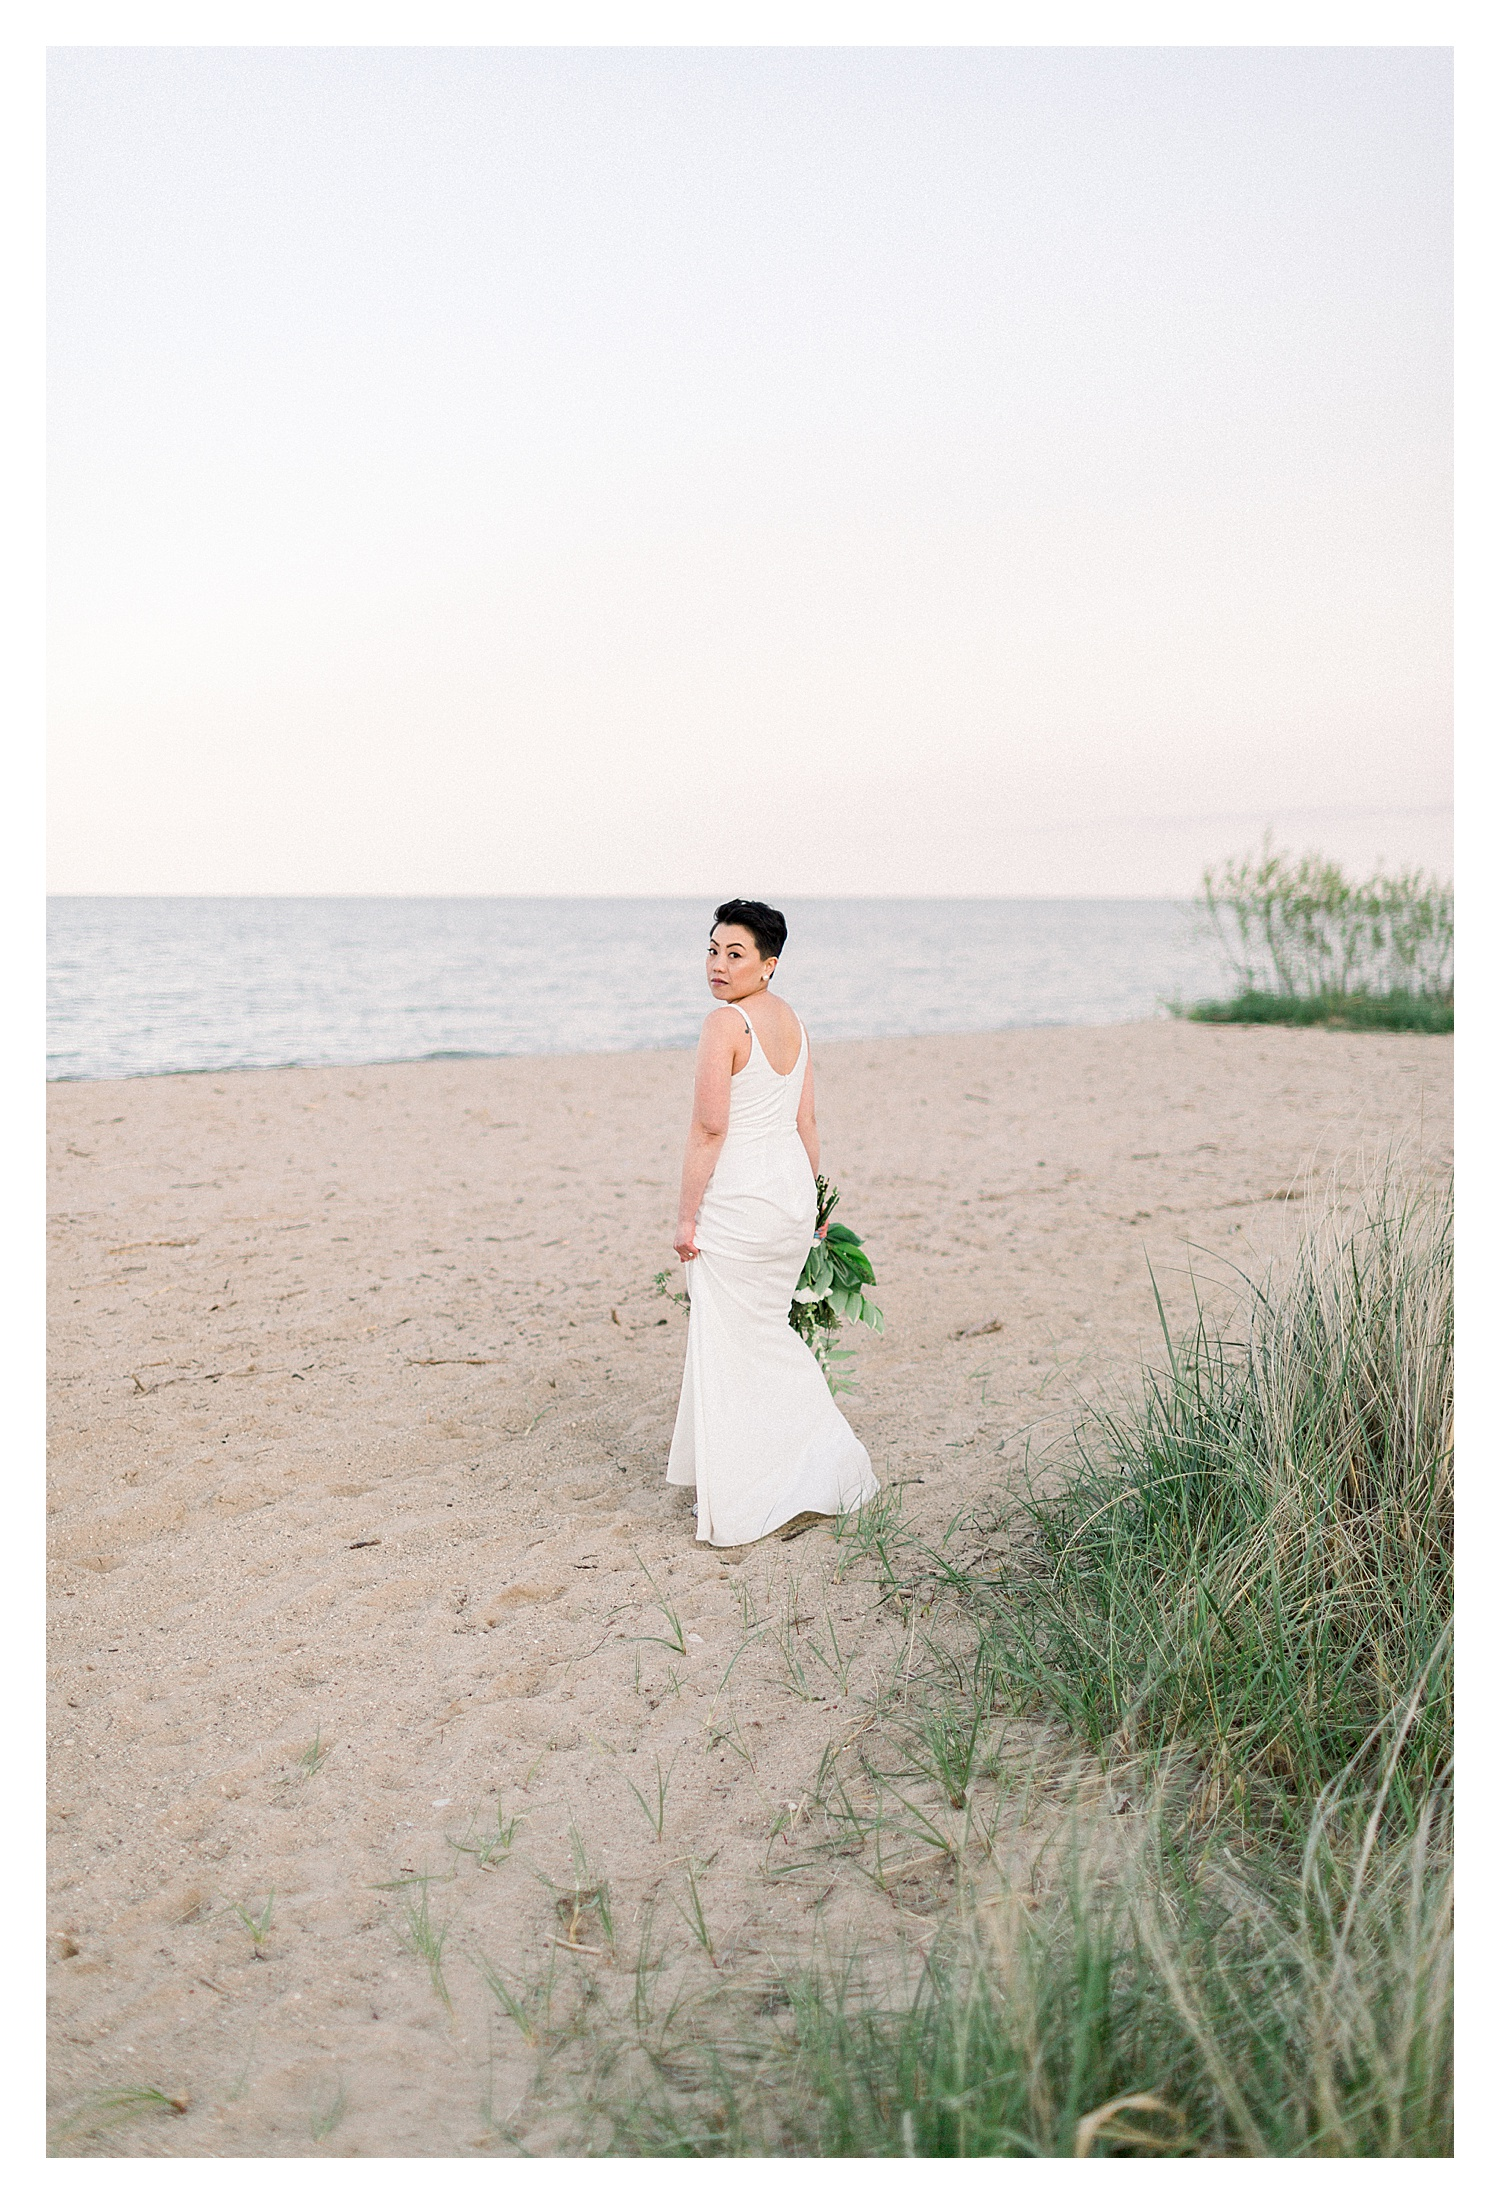 Wisconsin_Wedding_Photographers_Elle_x_Troy_Photography_Kewaunee_Beach_Anniversary_Wedding_Styled_Shoot_Christine_&_Drew-17.jpg